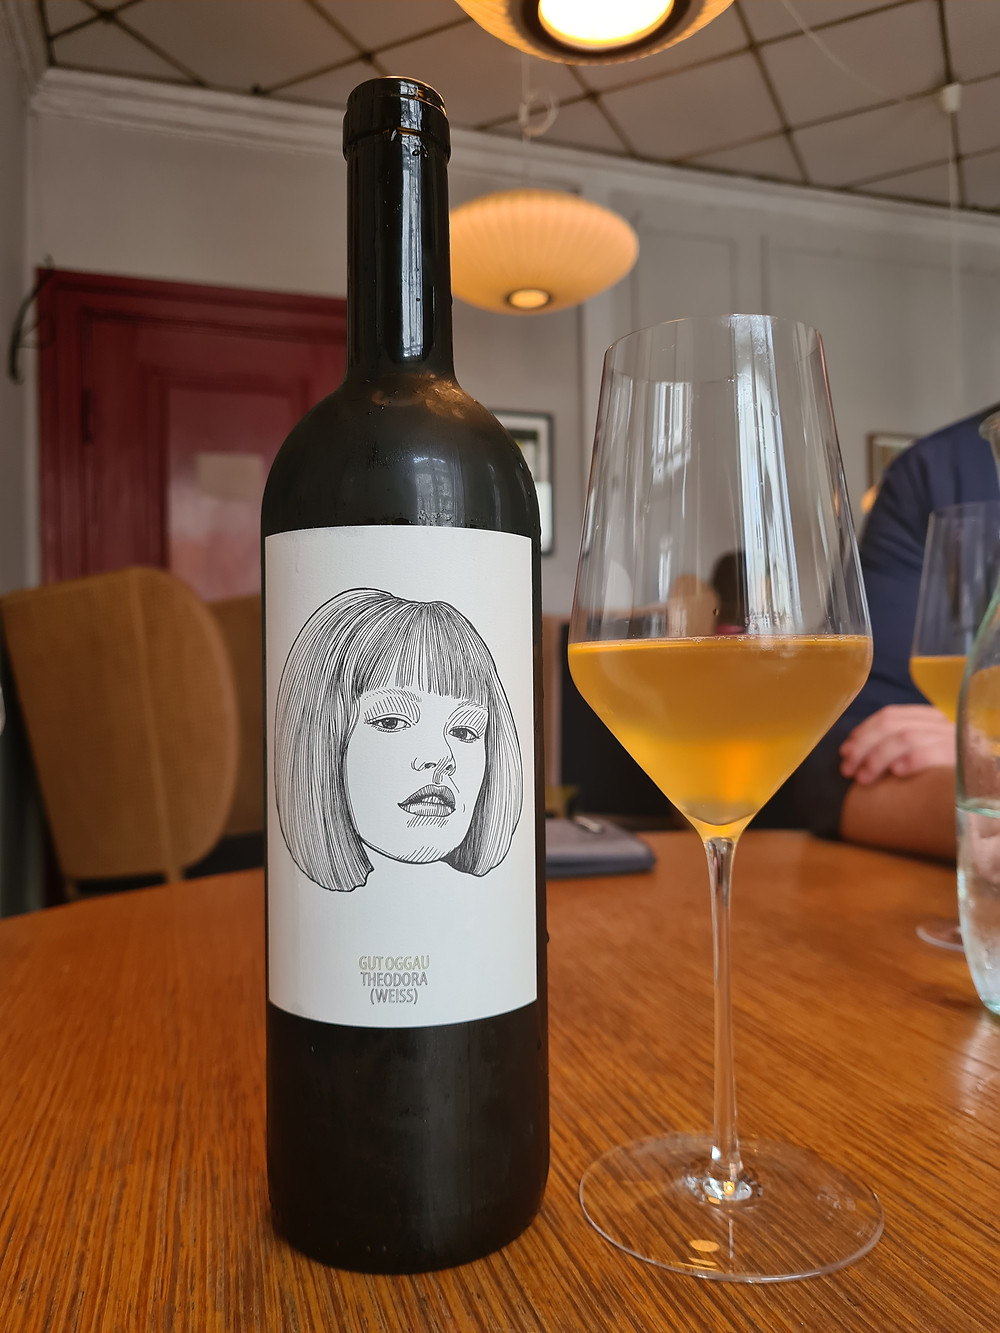 wine, natural wine, theodora